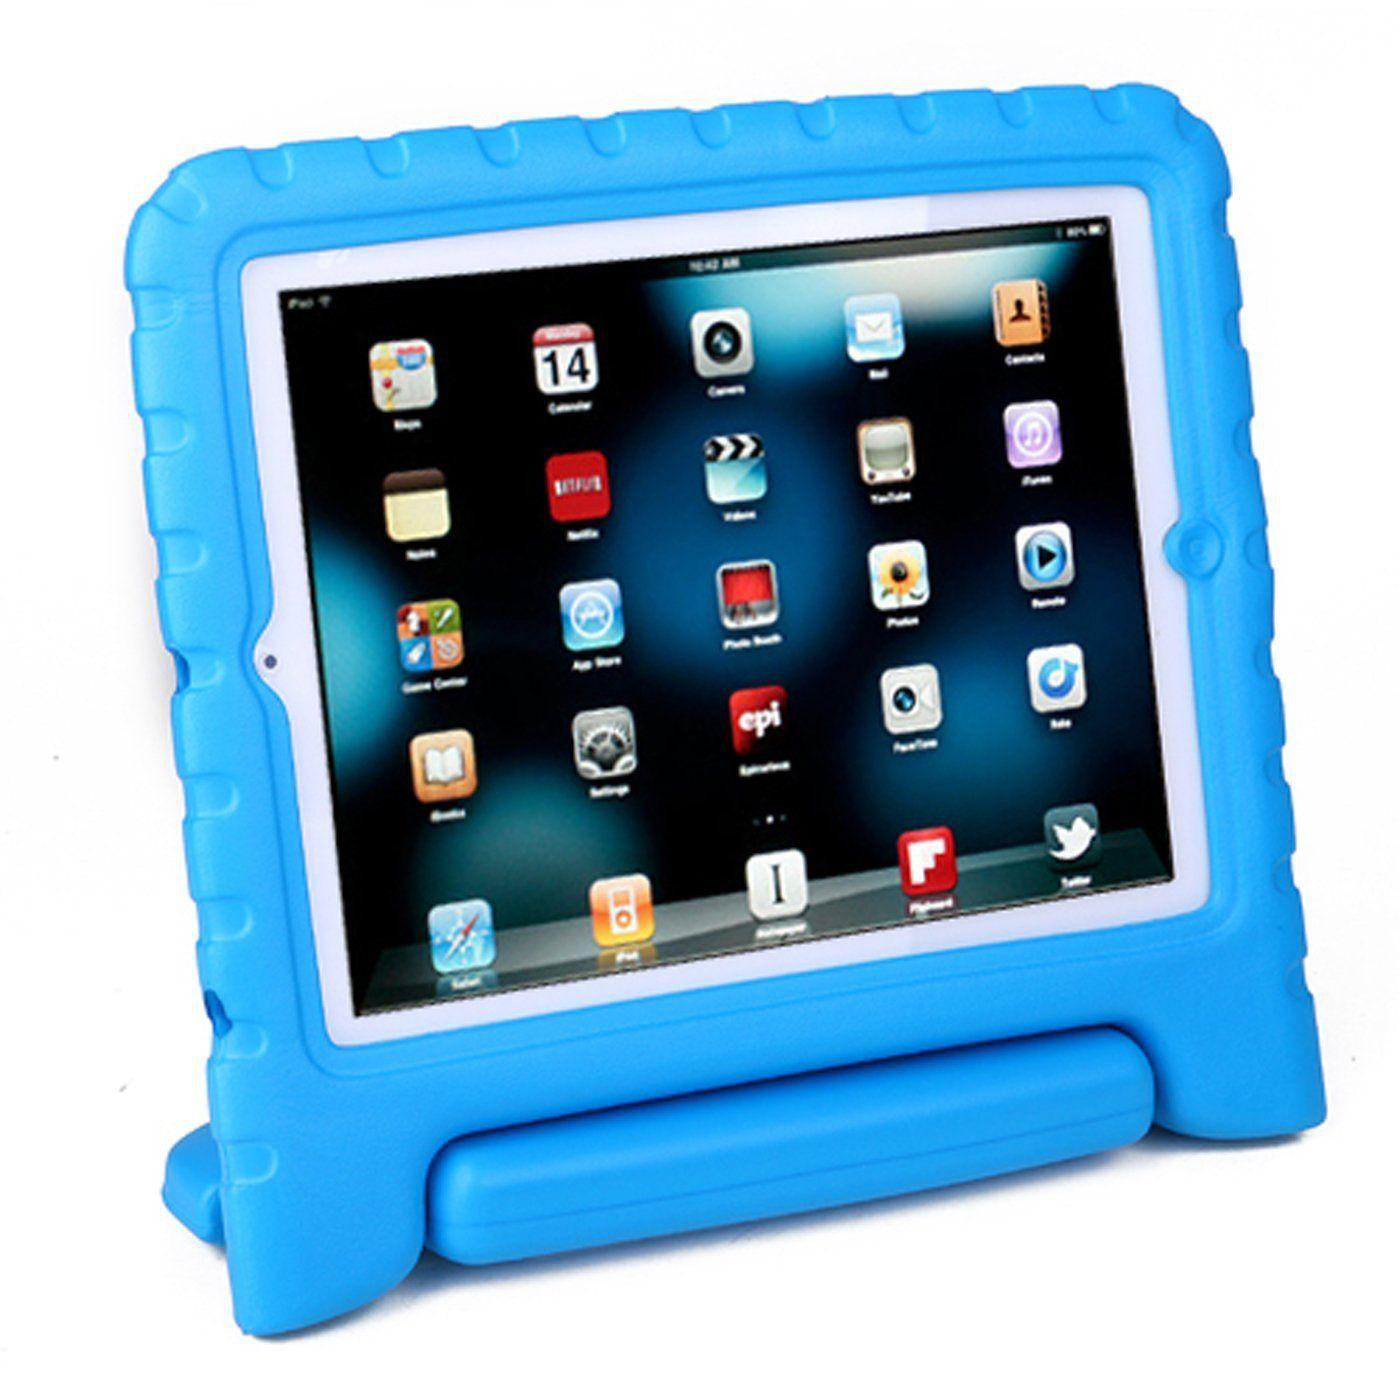 Hde shock proof ipad case for kids bumper